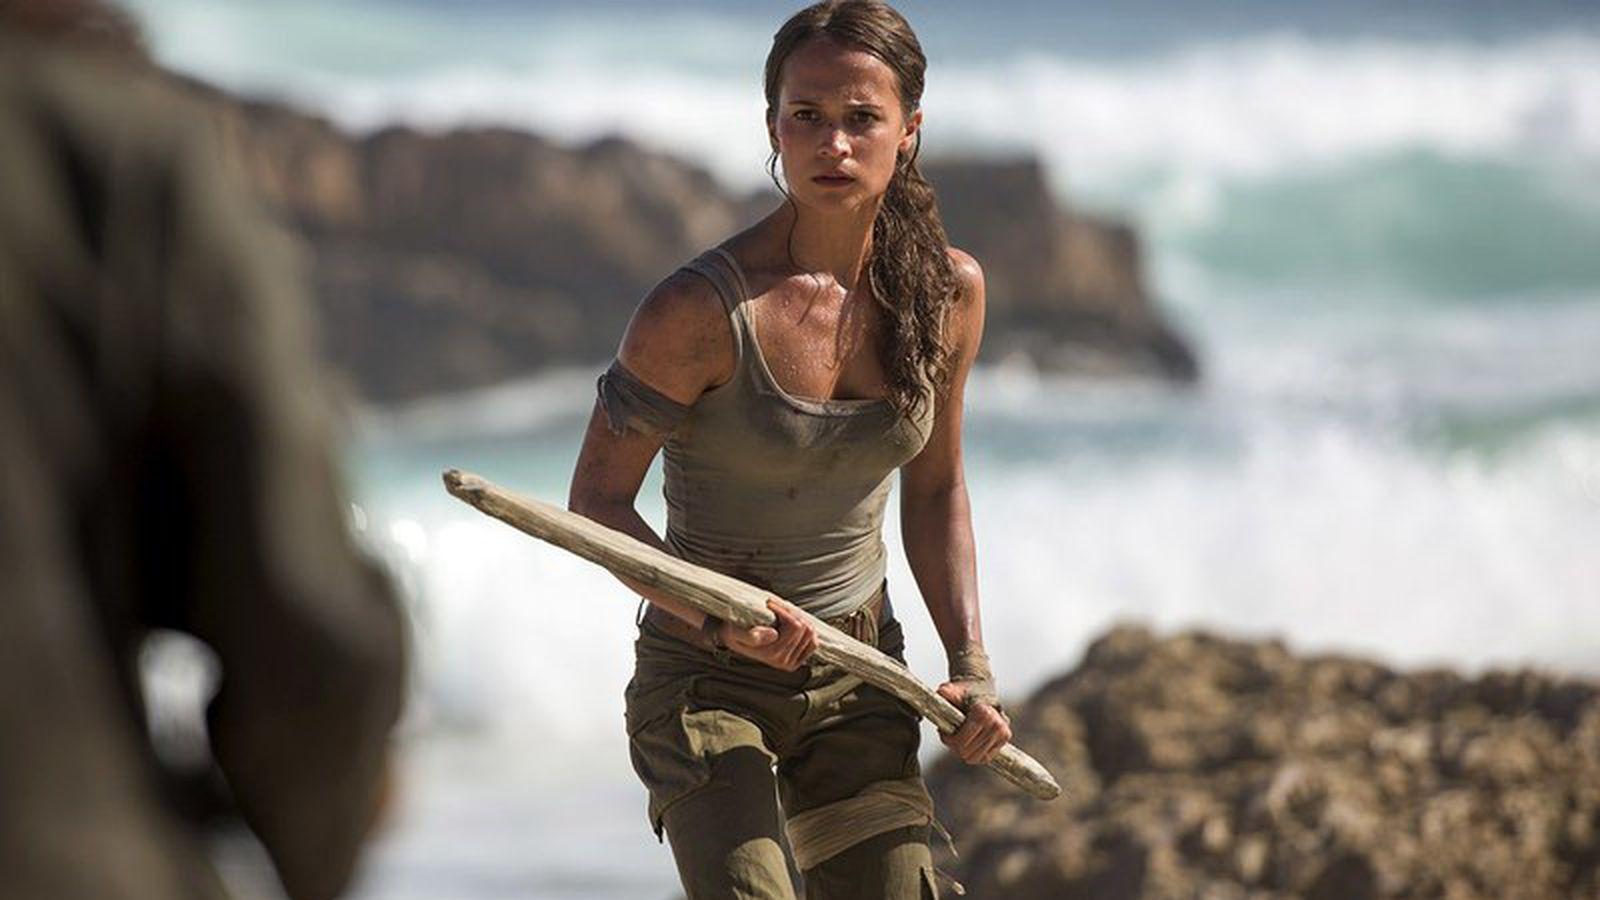 Alicia Vikanders Lara Croft looks just like the new Tomb Raider video games